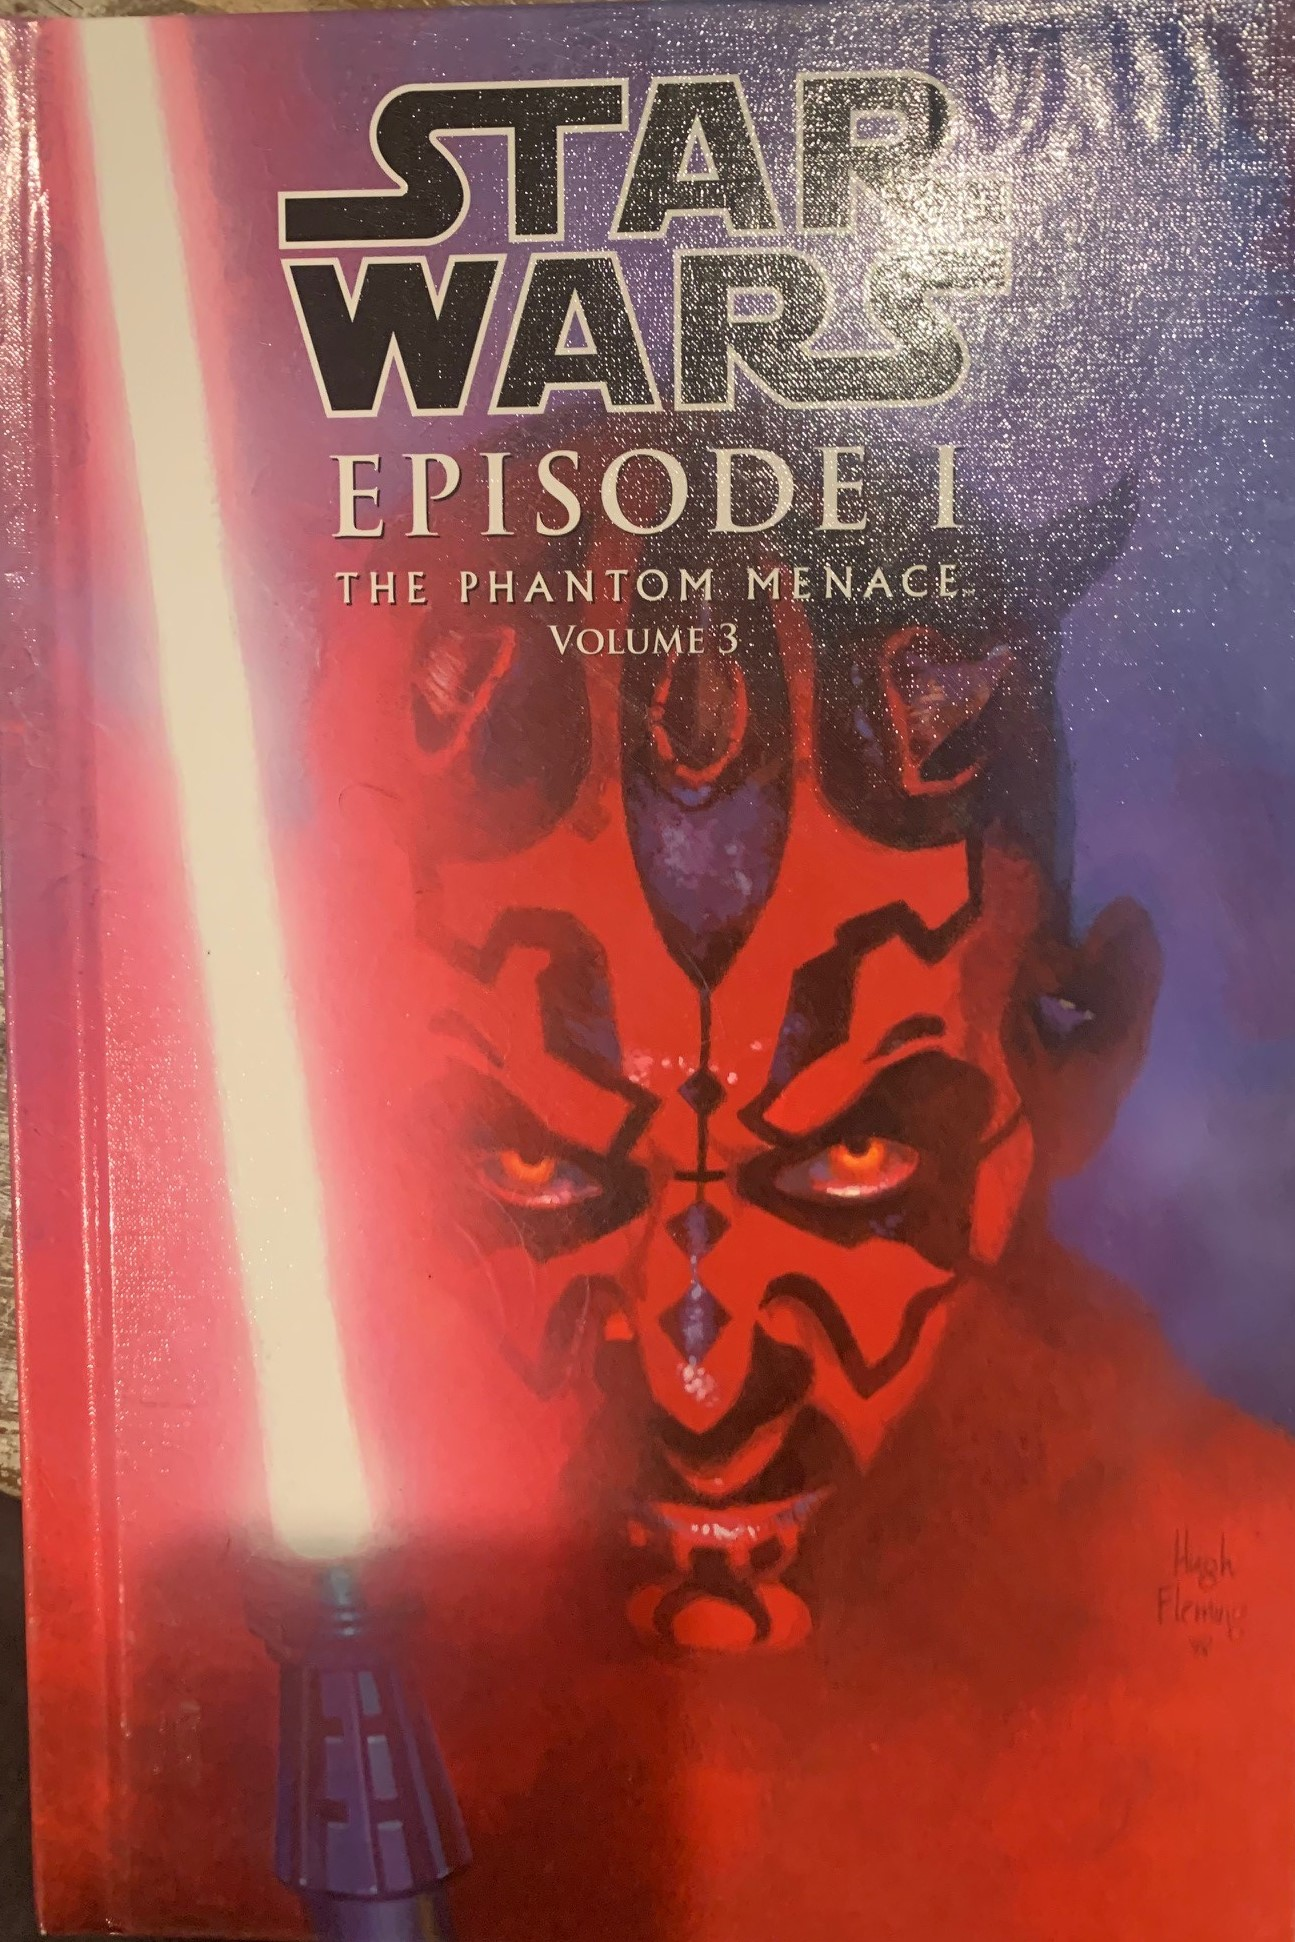 Star Wars Episode I: The Phantom Menace (Spotlight Comic Edition, Volume 3)